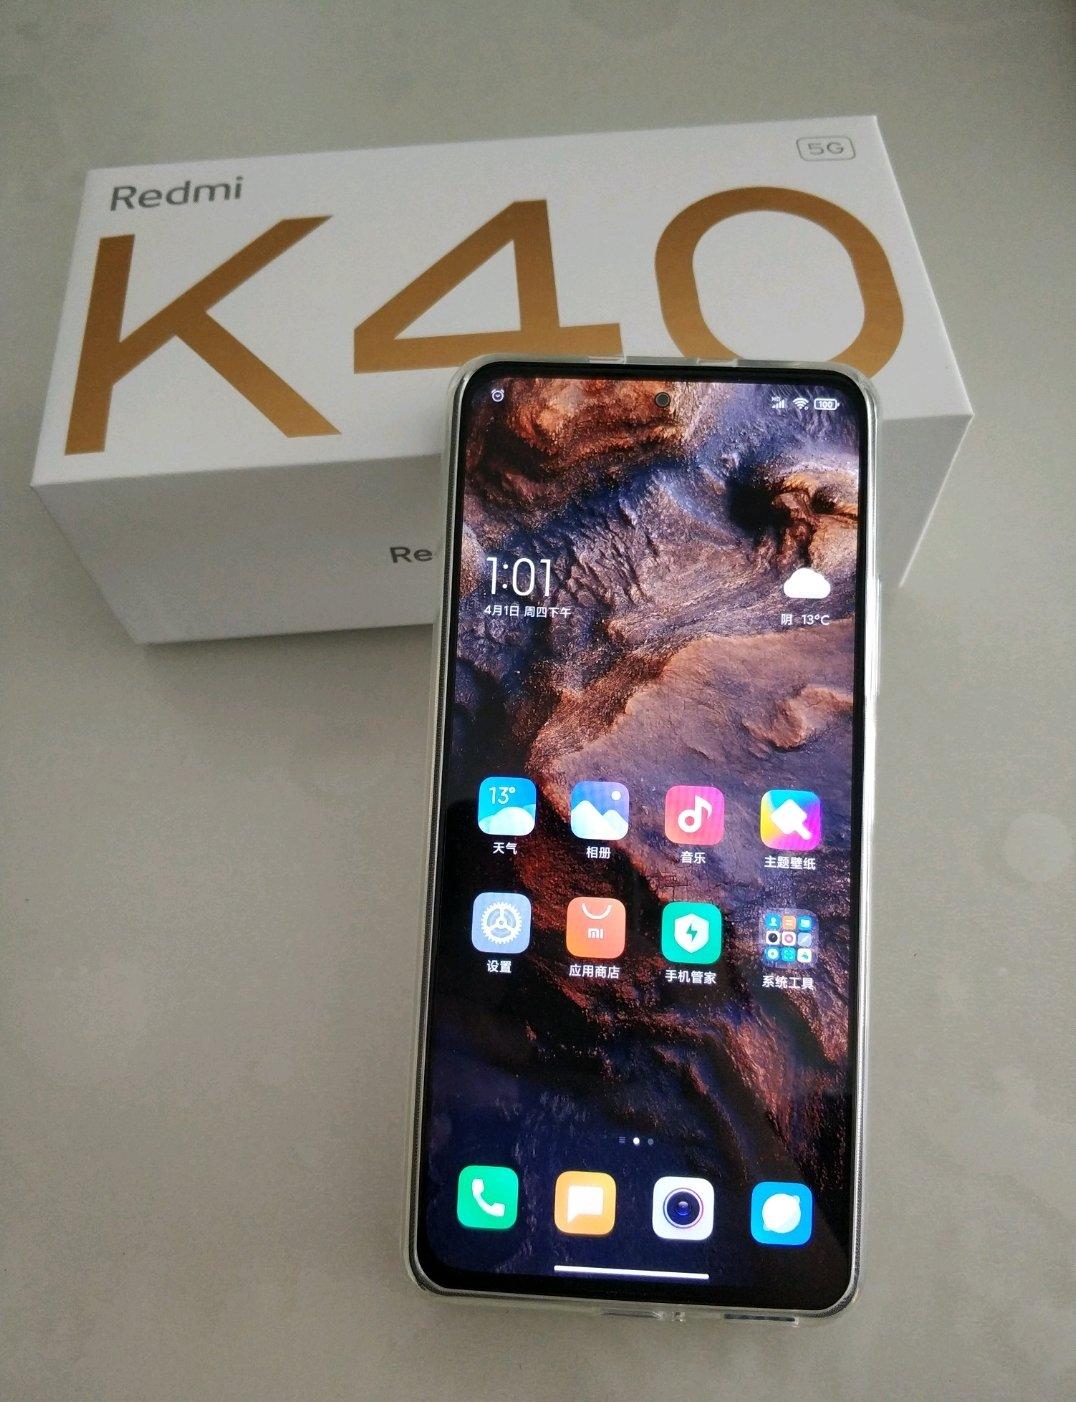 Redmi K40三星E4直屏手机,玩游戏少不了的120Hz高刷